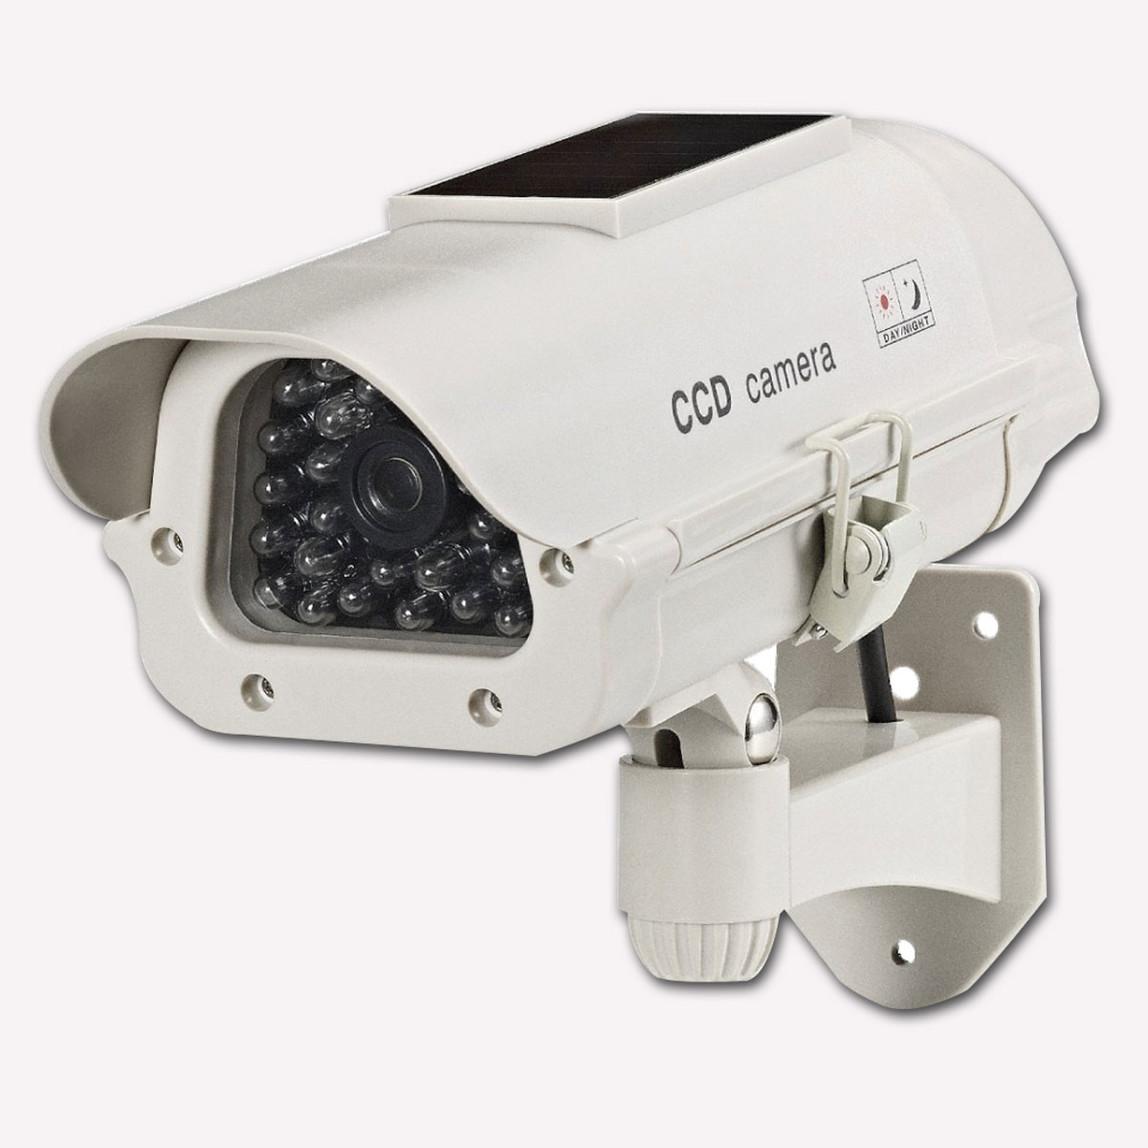 Caydırıcı Solar HGS Kamera LR-G11S